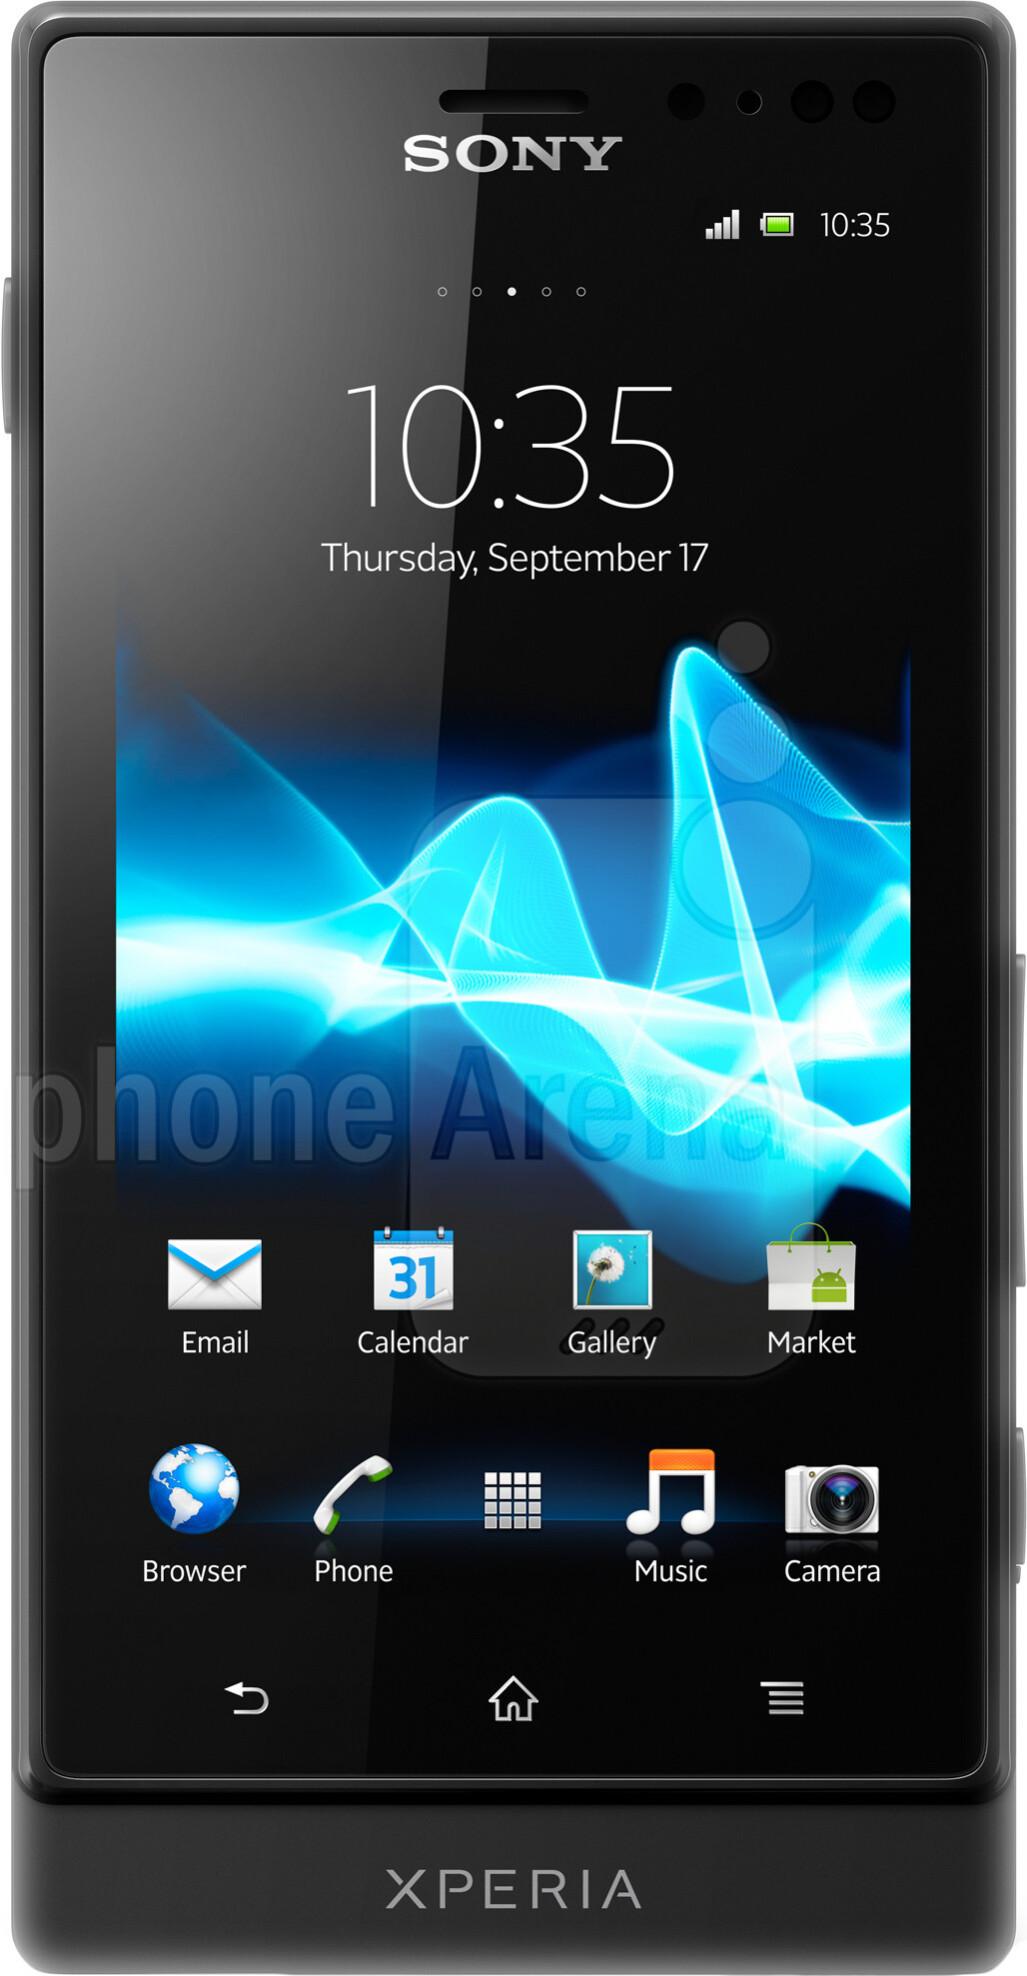 windows phone 8s vs sony xperia p